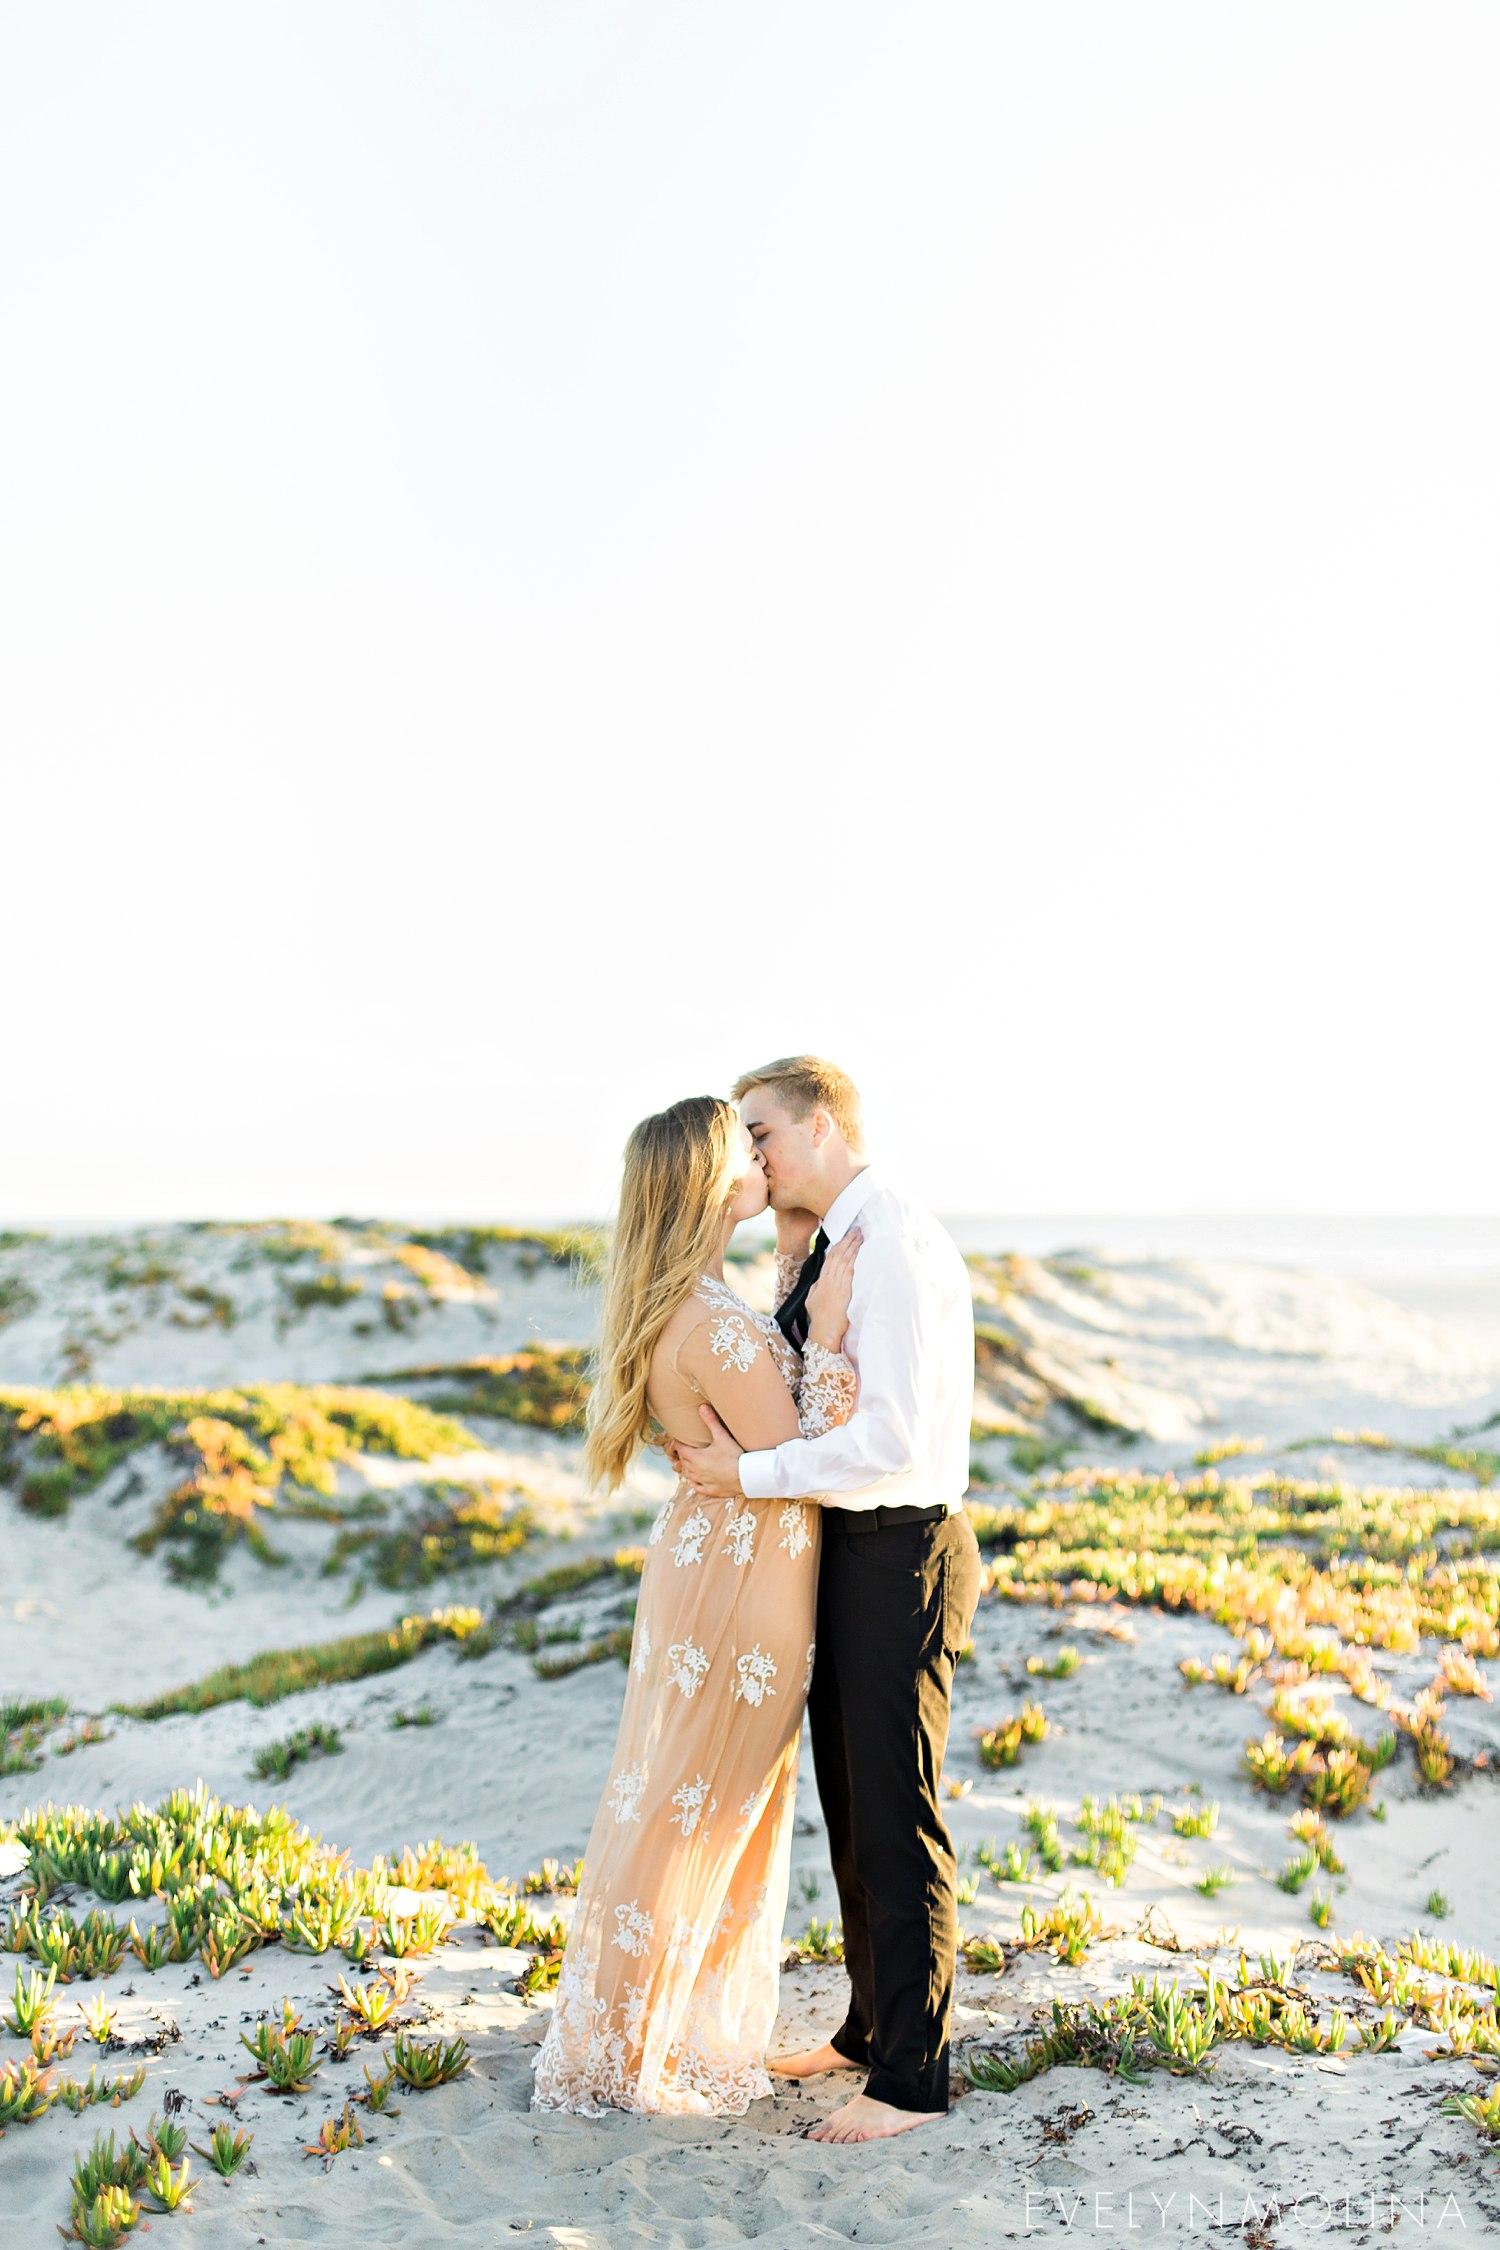 Coronado Engagement Session - Megan and Colin_036.jpg